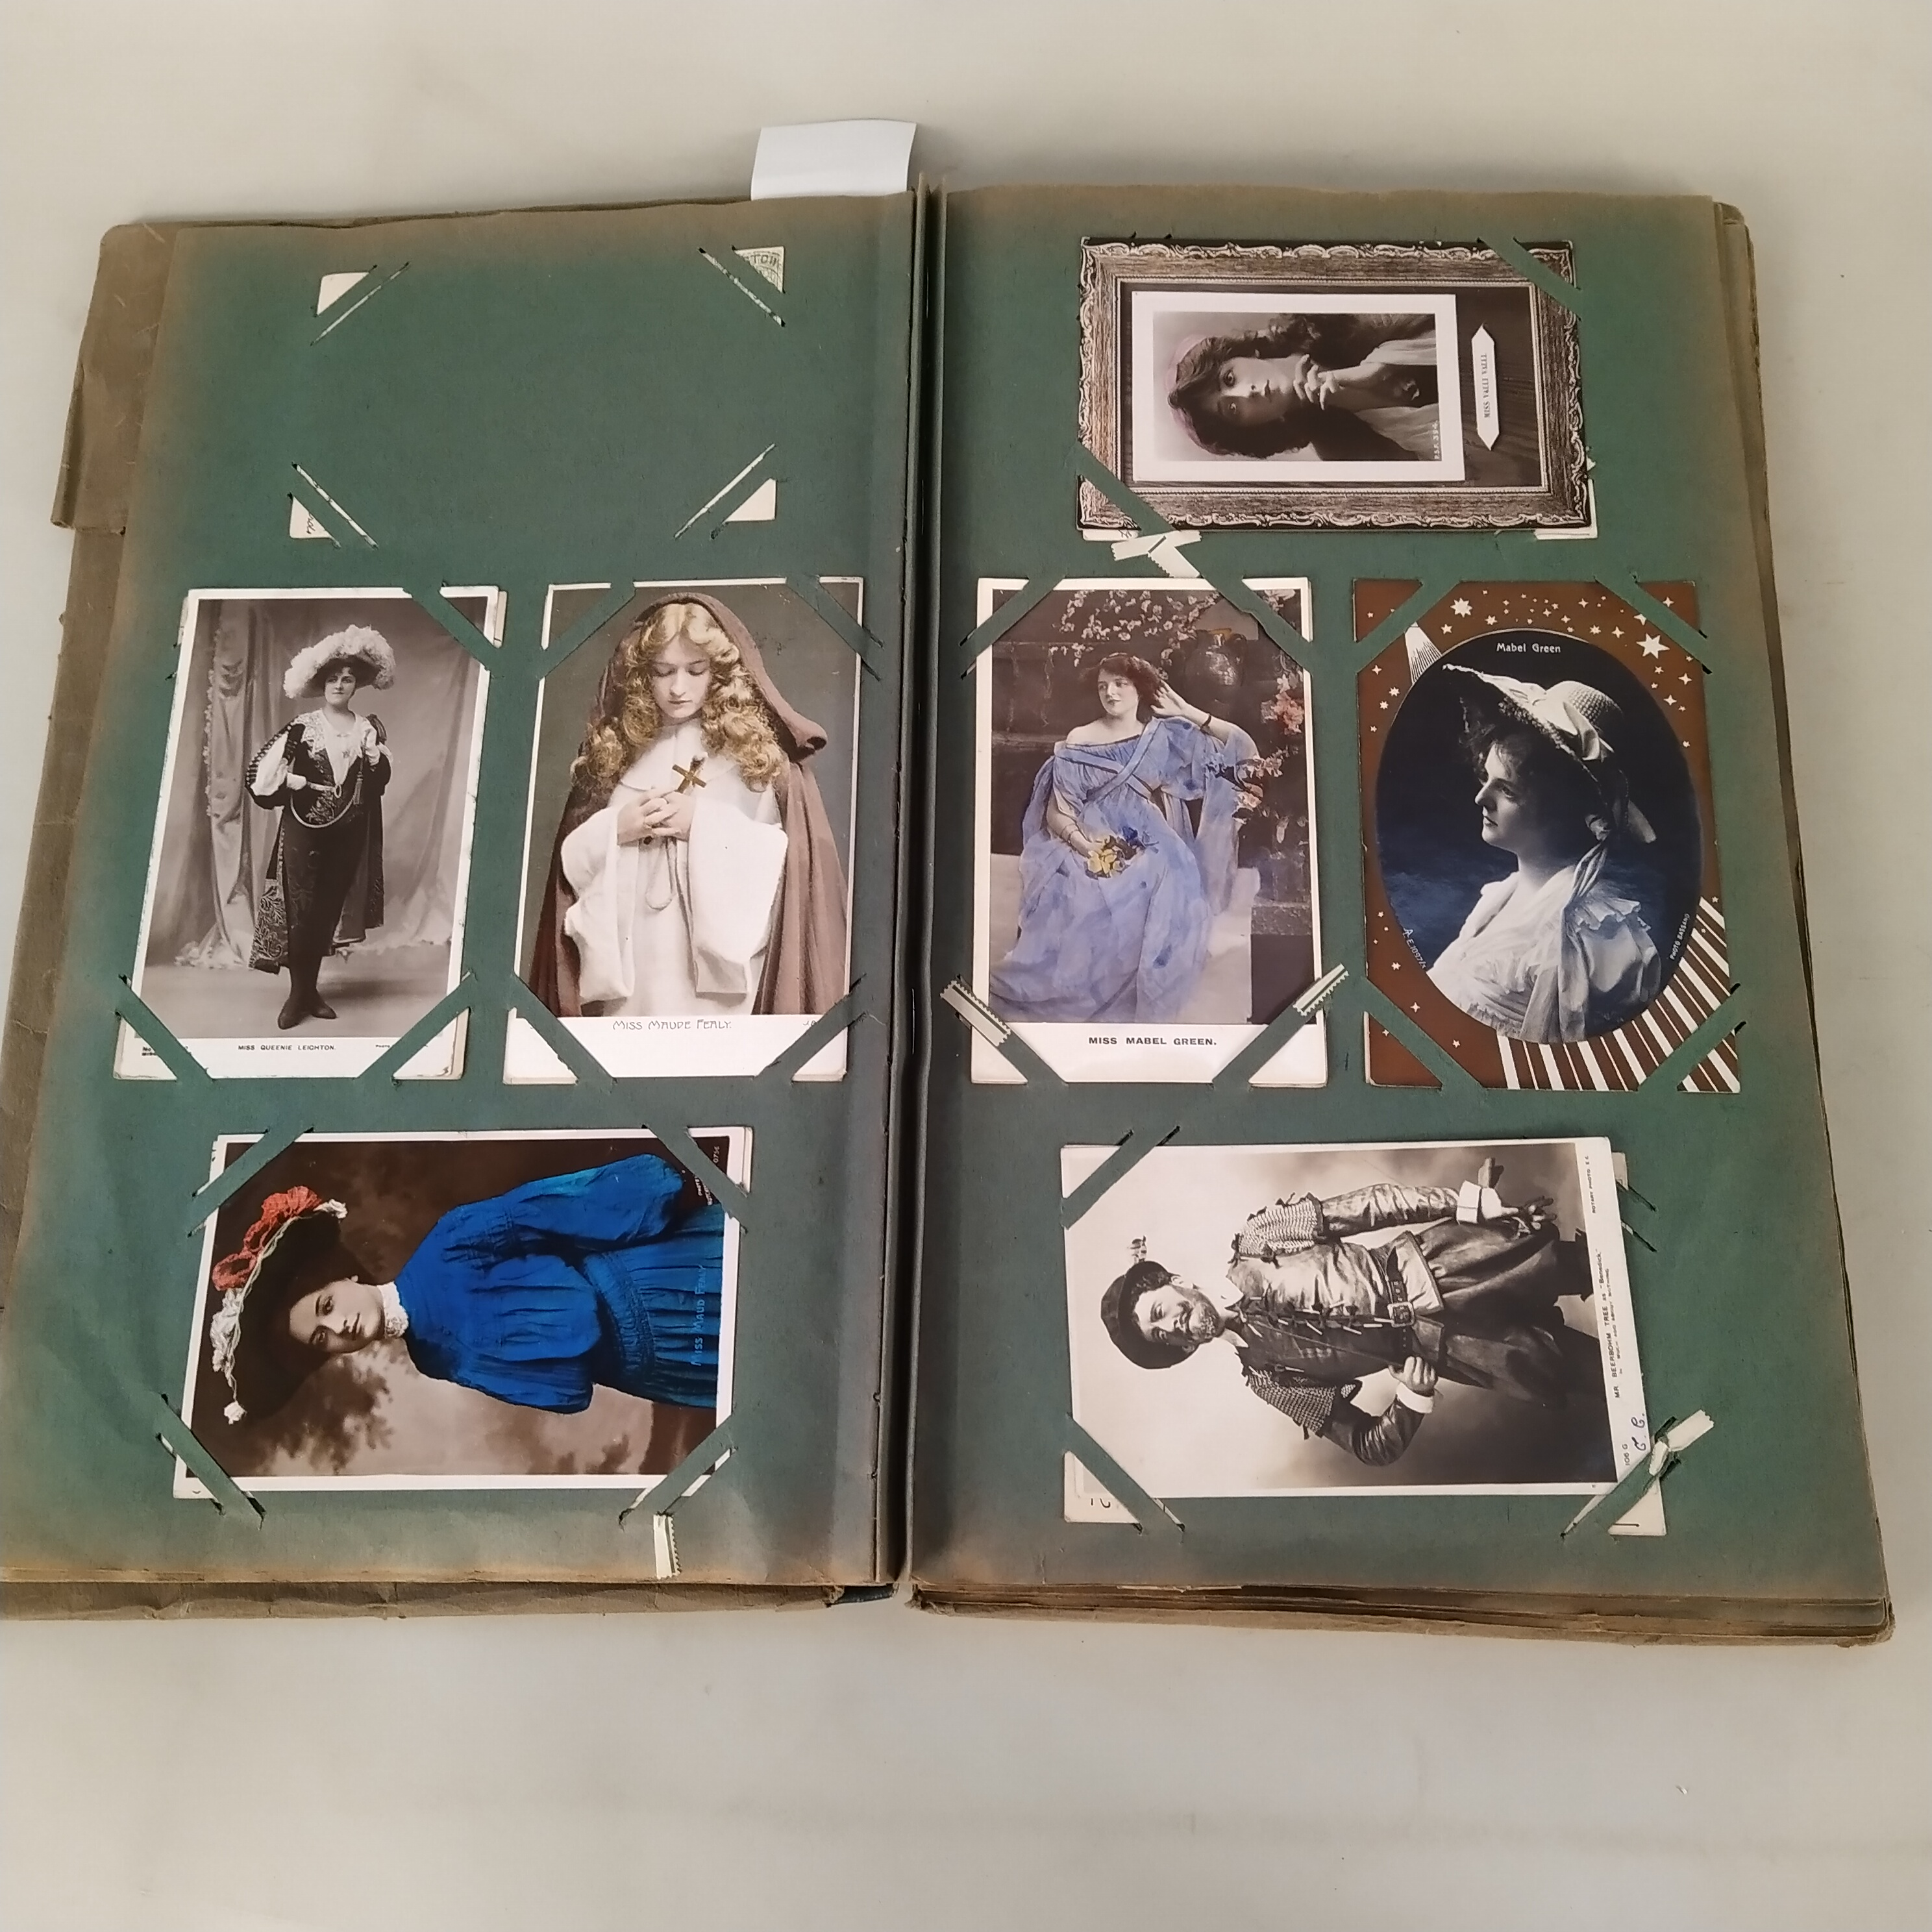 A vintage postcard album with many Edwardian era actresses, - Image 2 of 3